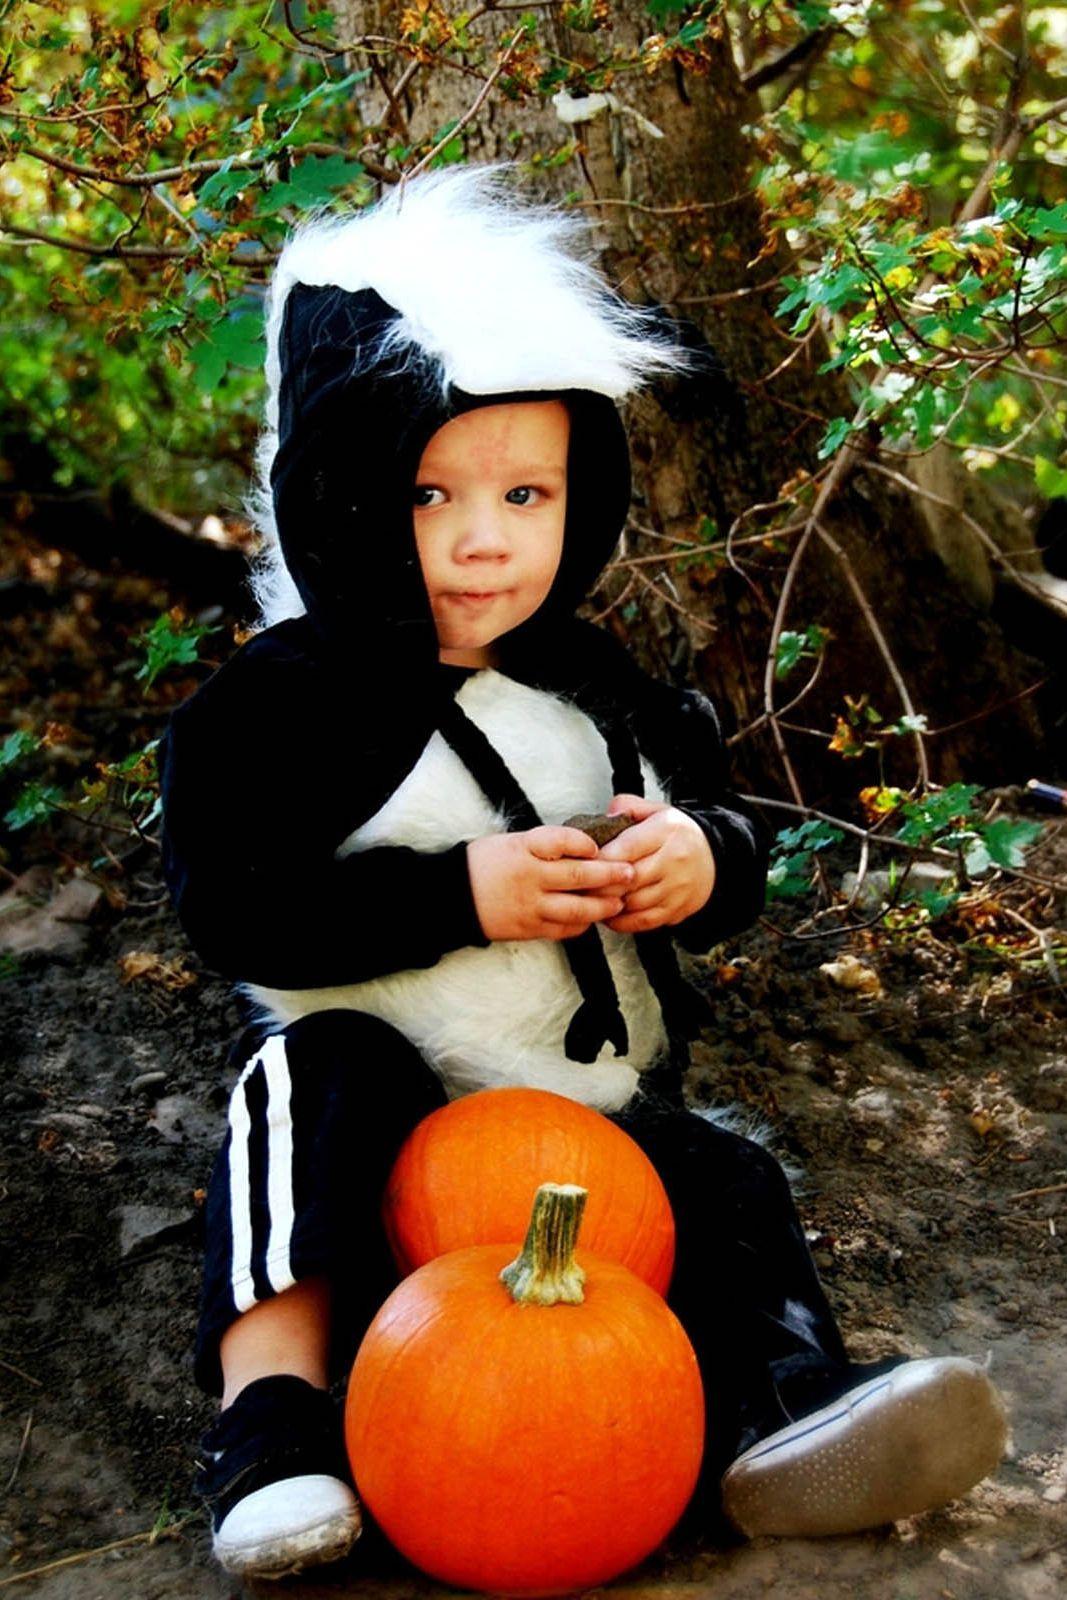 Baby Skunk Costume Halloween | 27 Cute Baby Halloween Costumes 2018 Best Ideas For Boy Girl